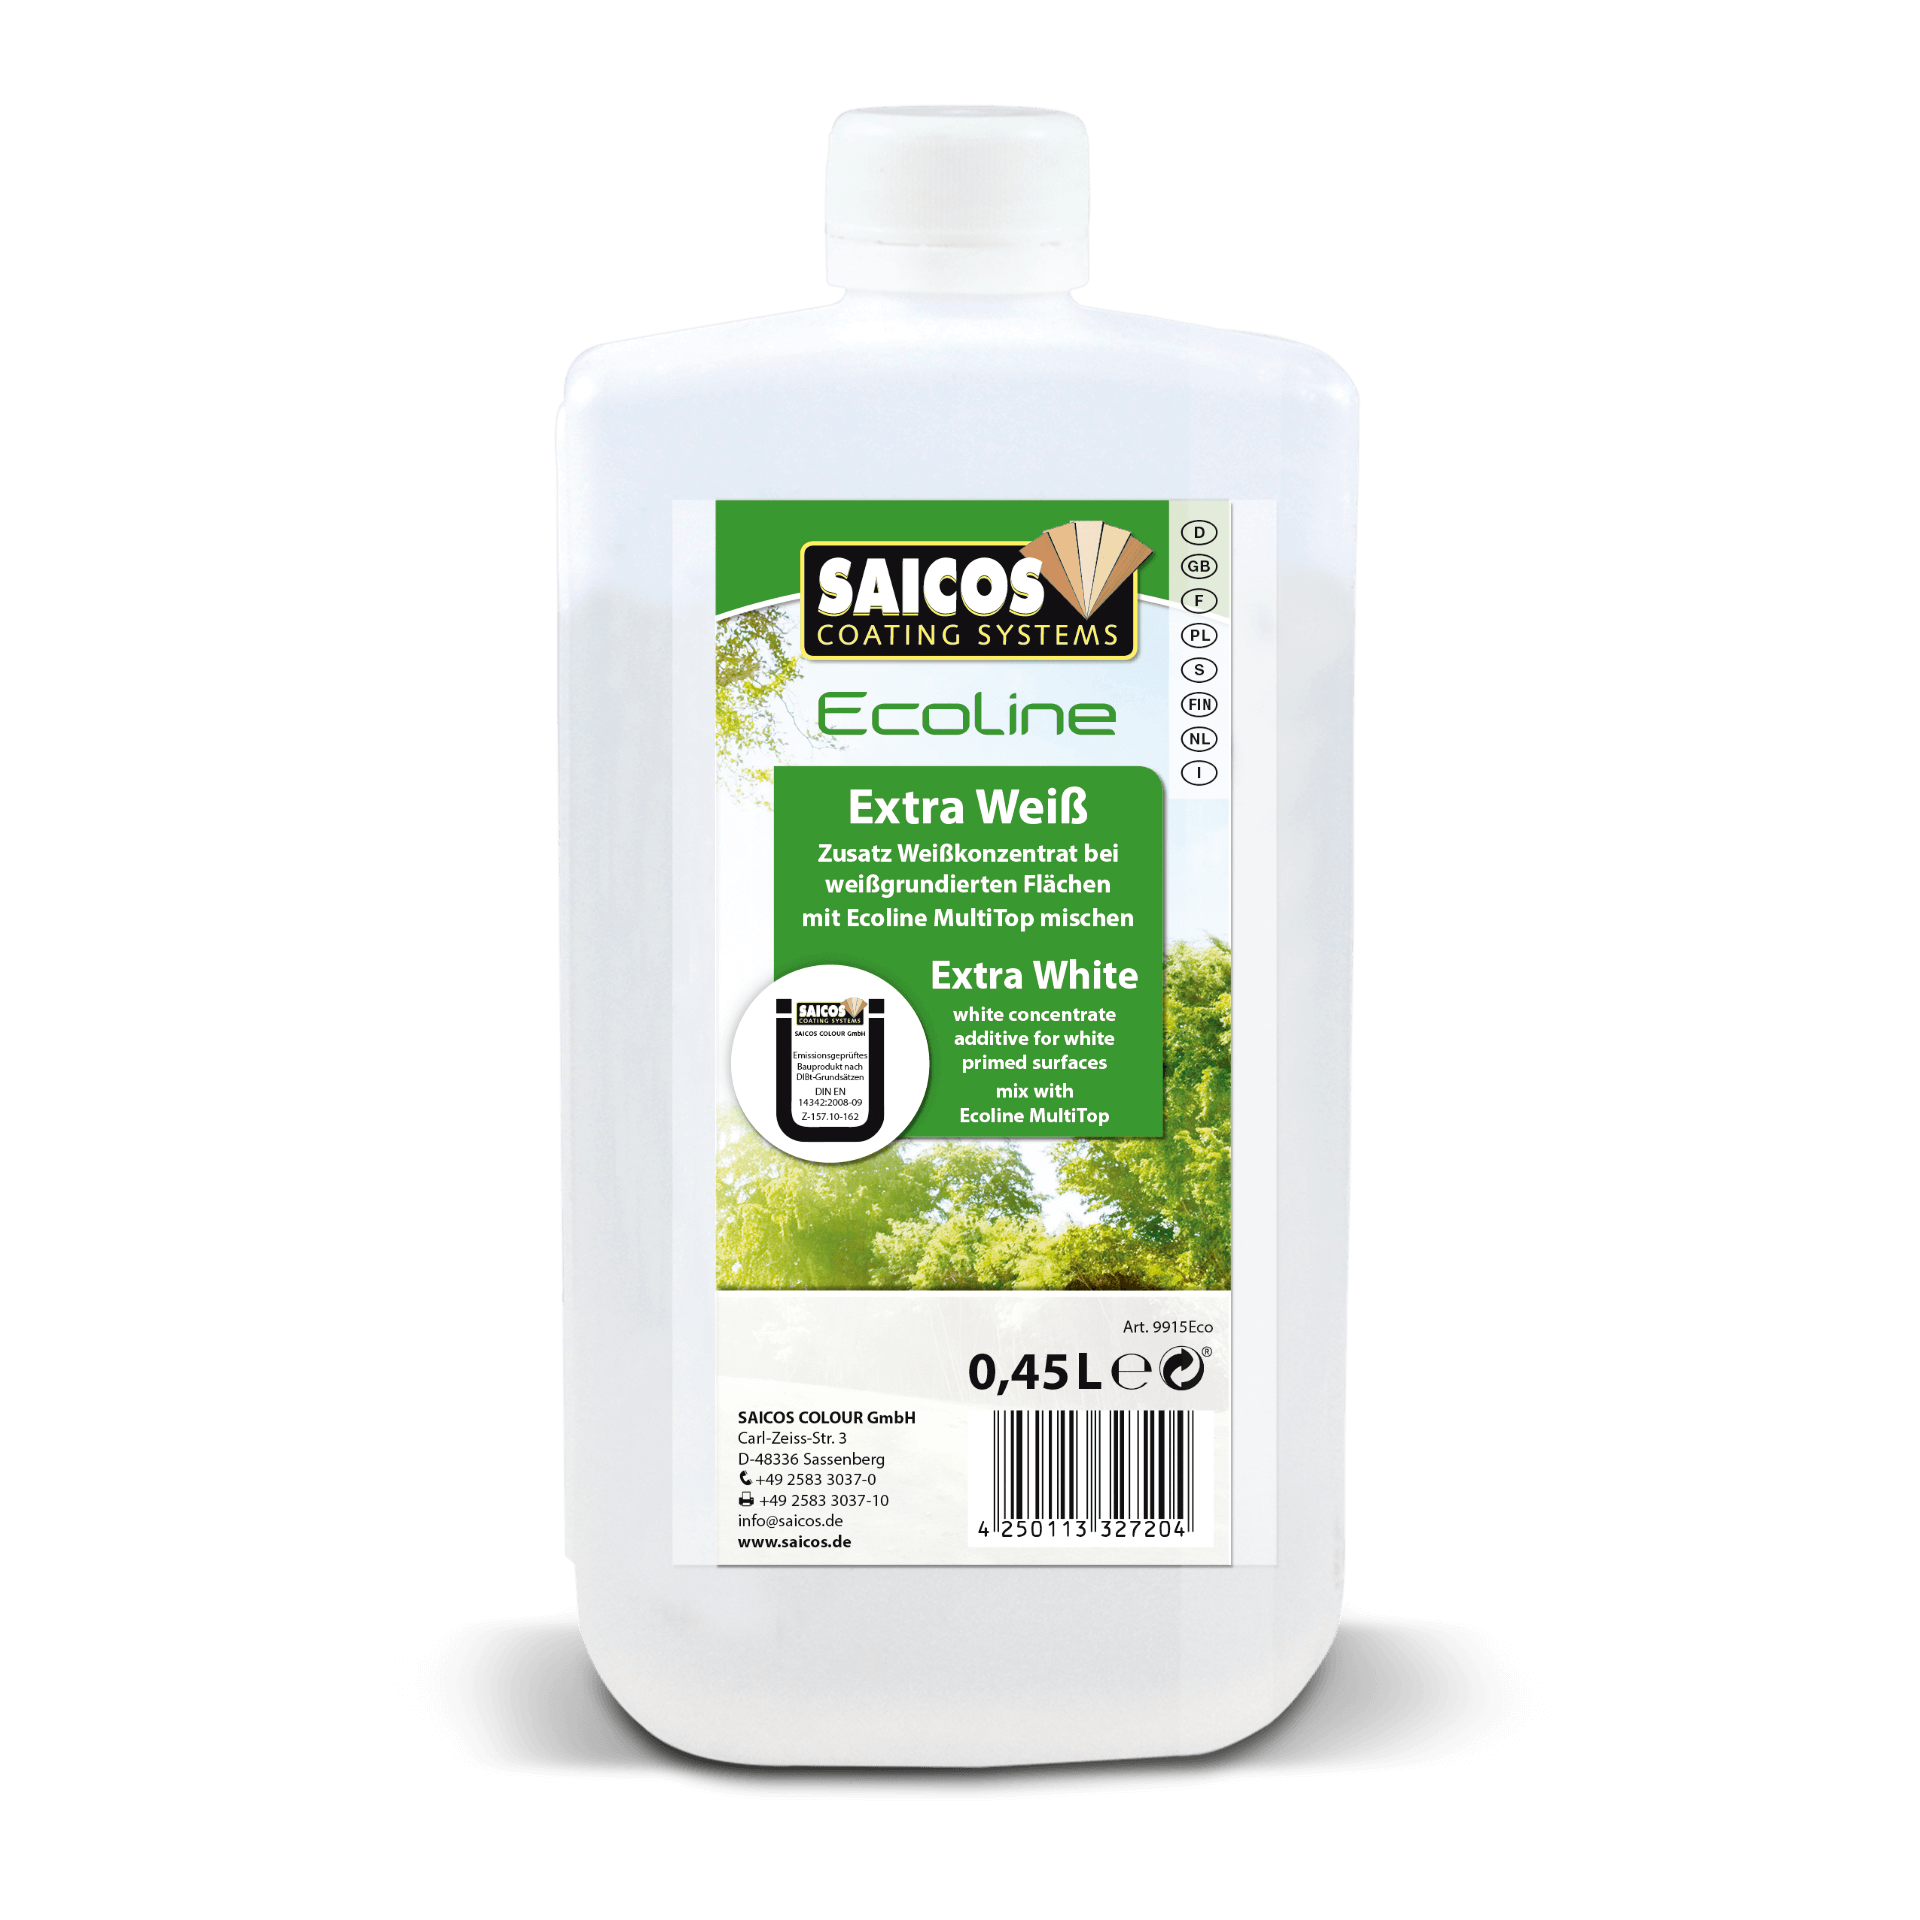 Saicos Ecoline MultiTop Extra Weiß extra white englisch